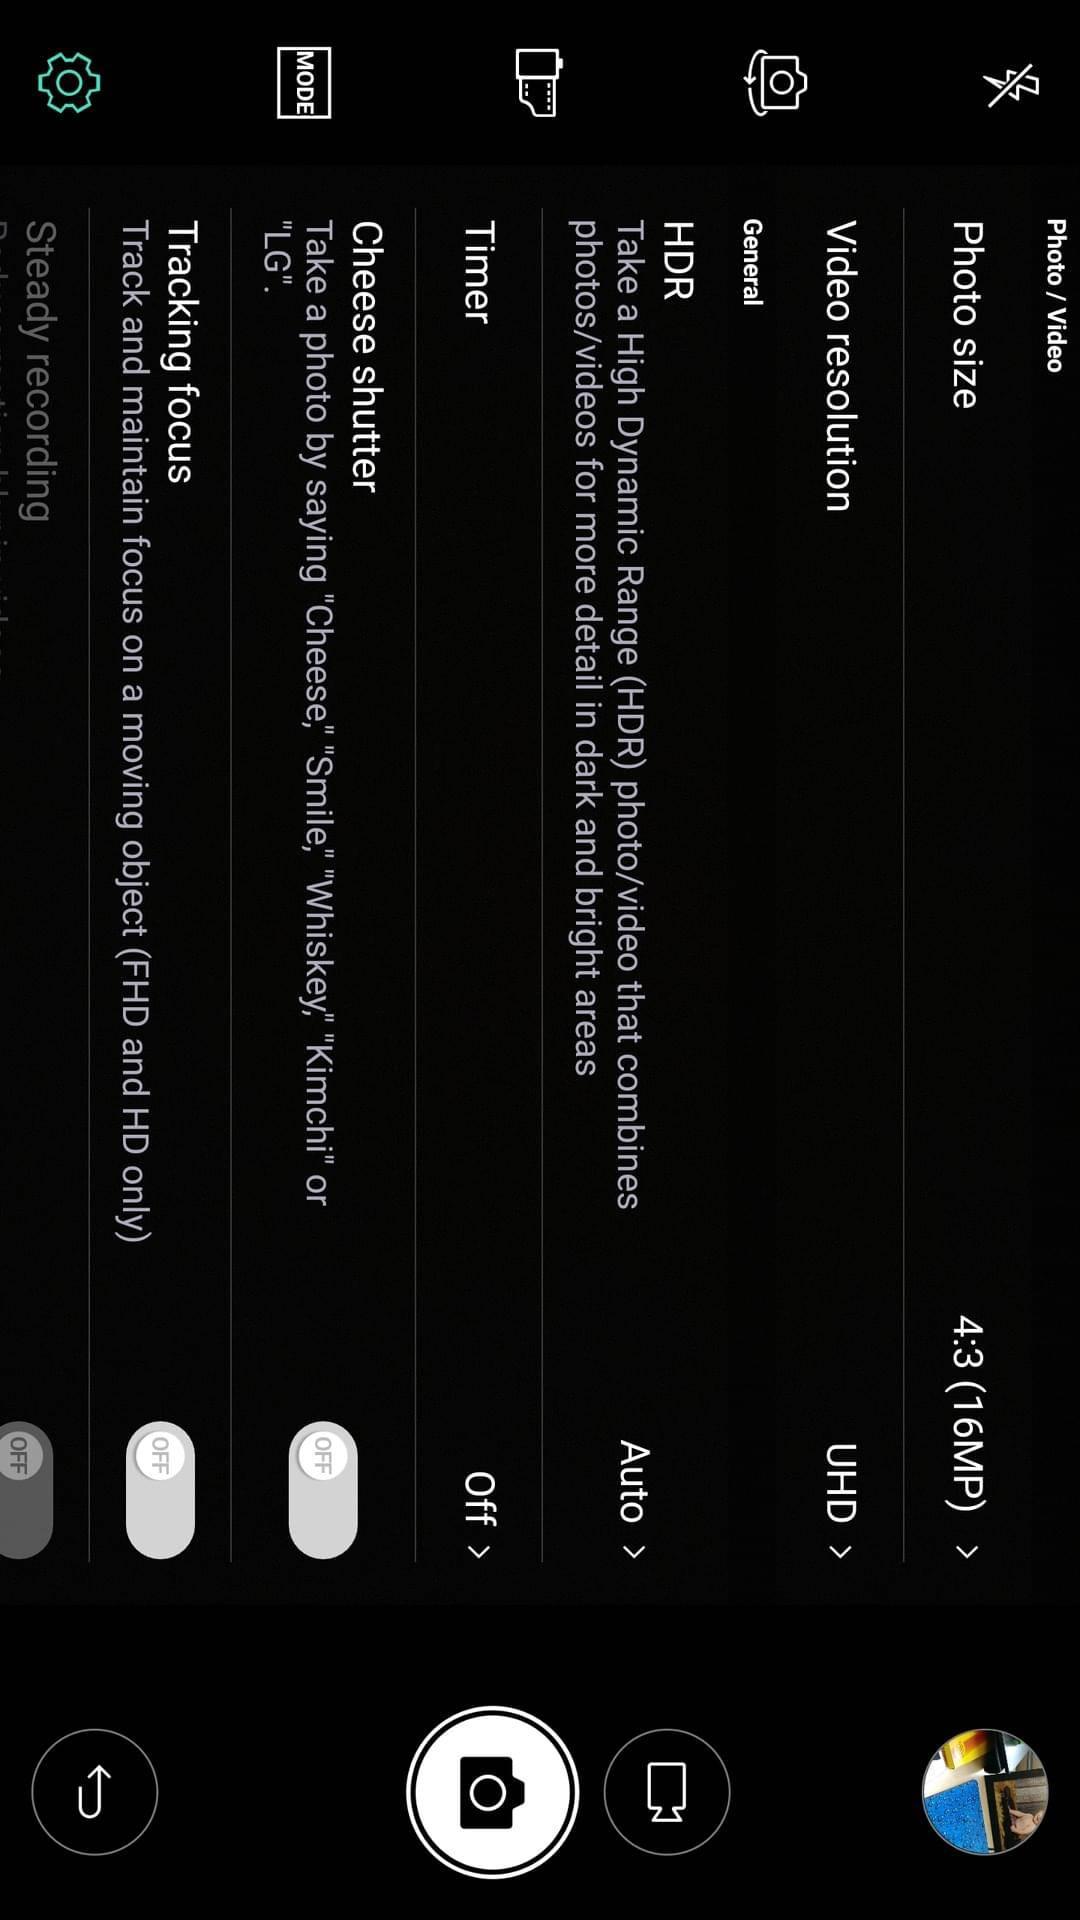 LG V20 AH NS screenshots camera options 3